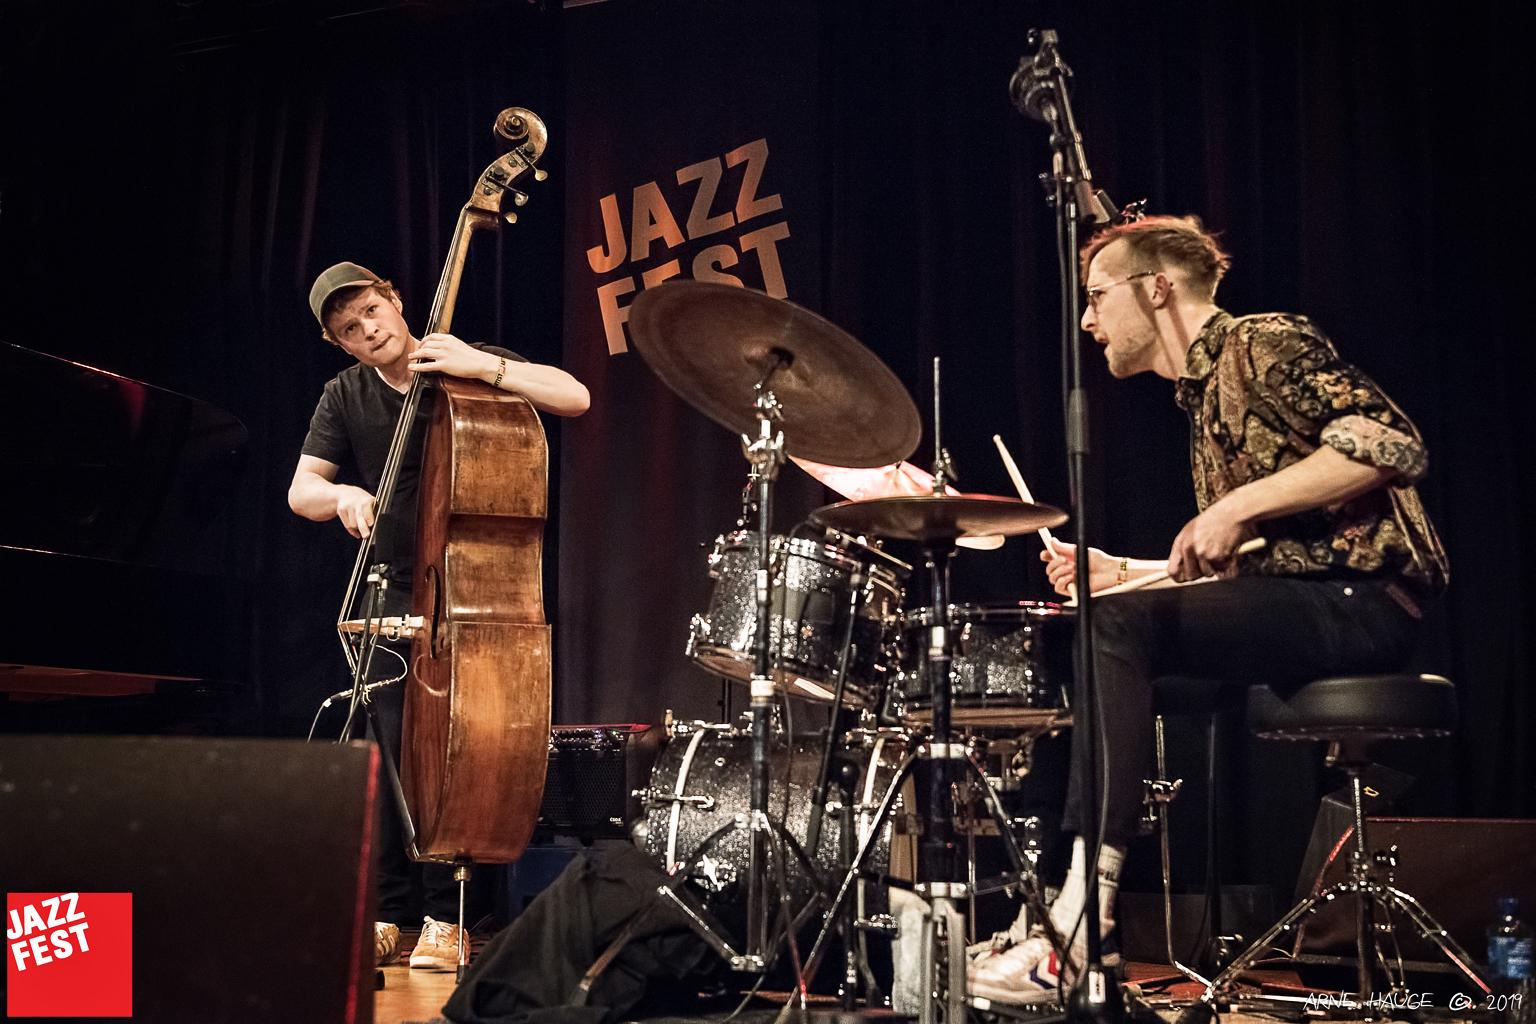 190509 Hegge (Jazz Expo) @ Dokkhuset - foto Arne Hauge_009.JPG